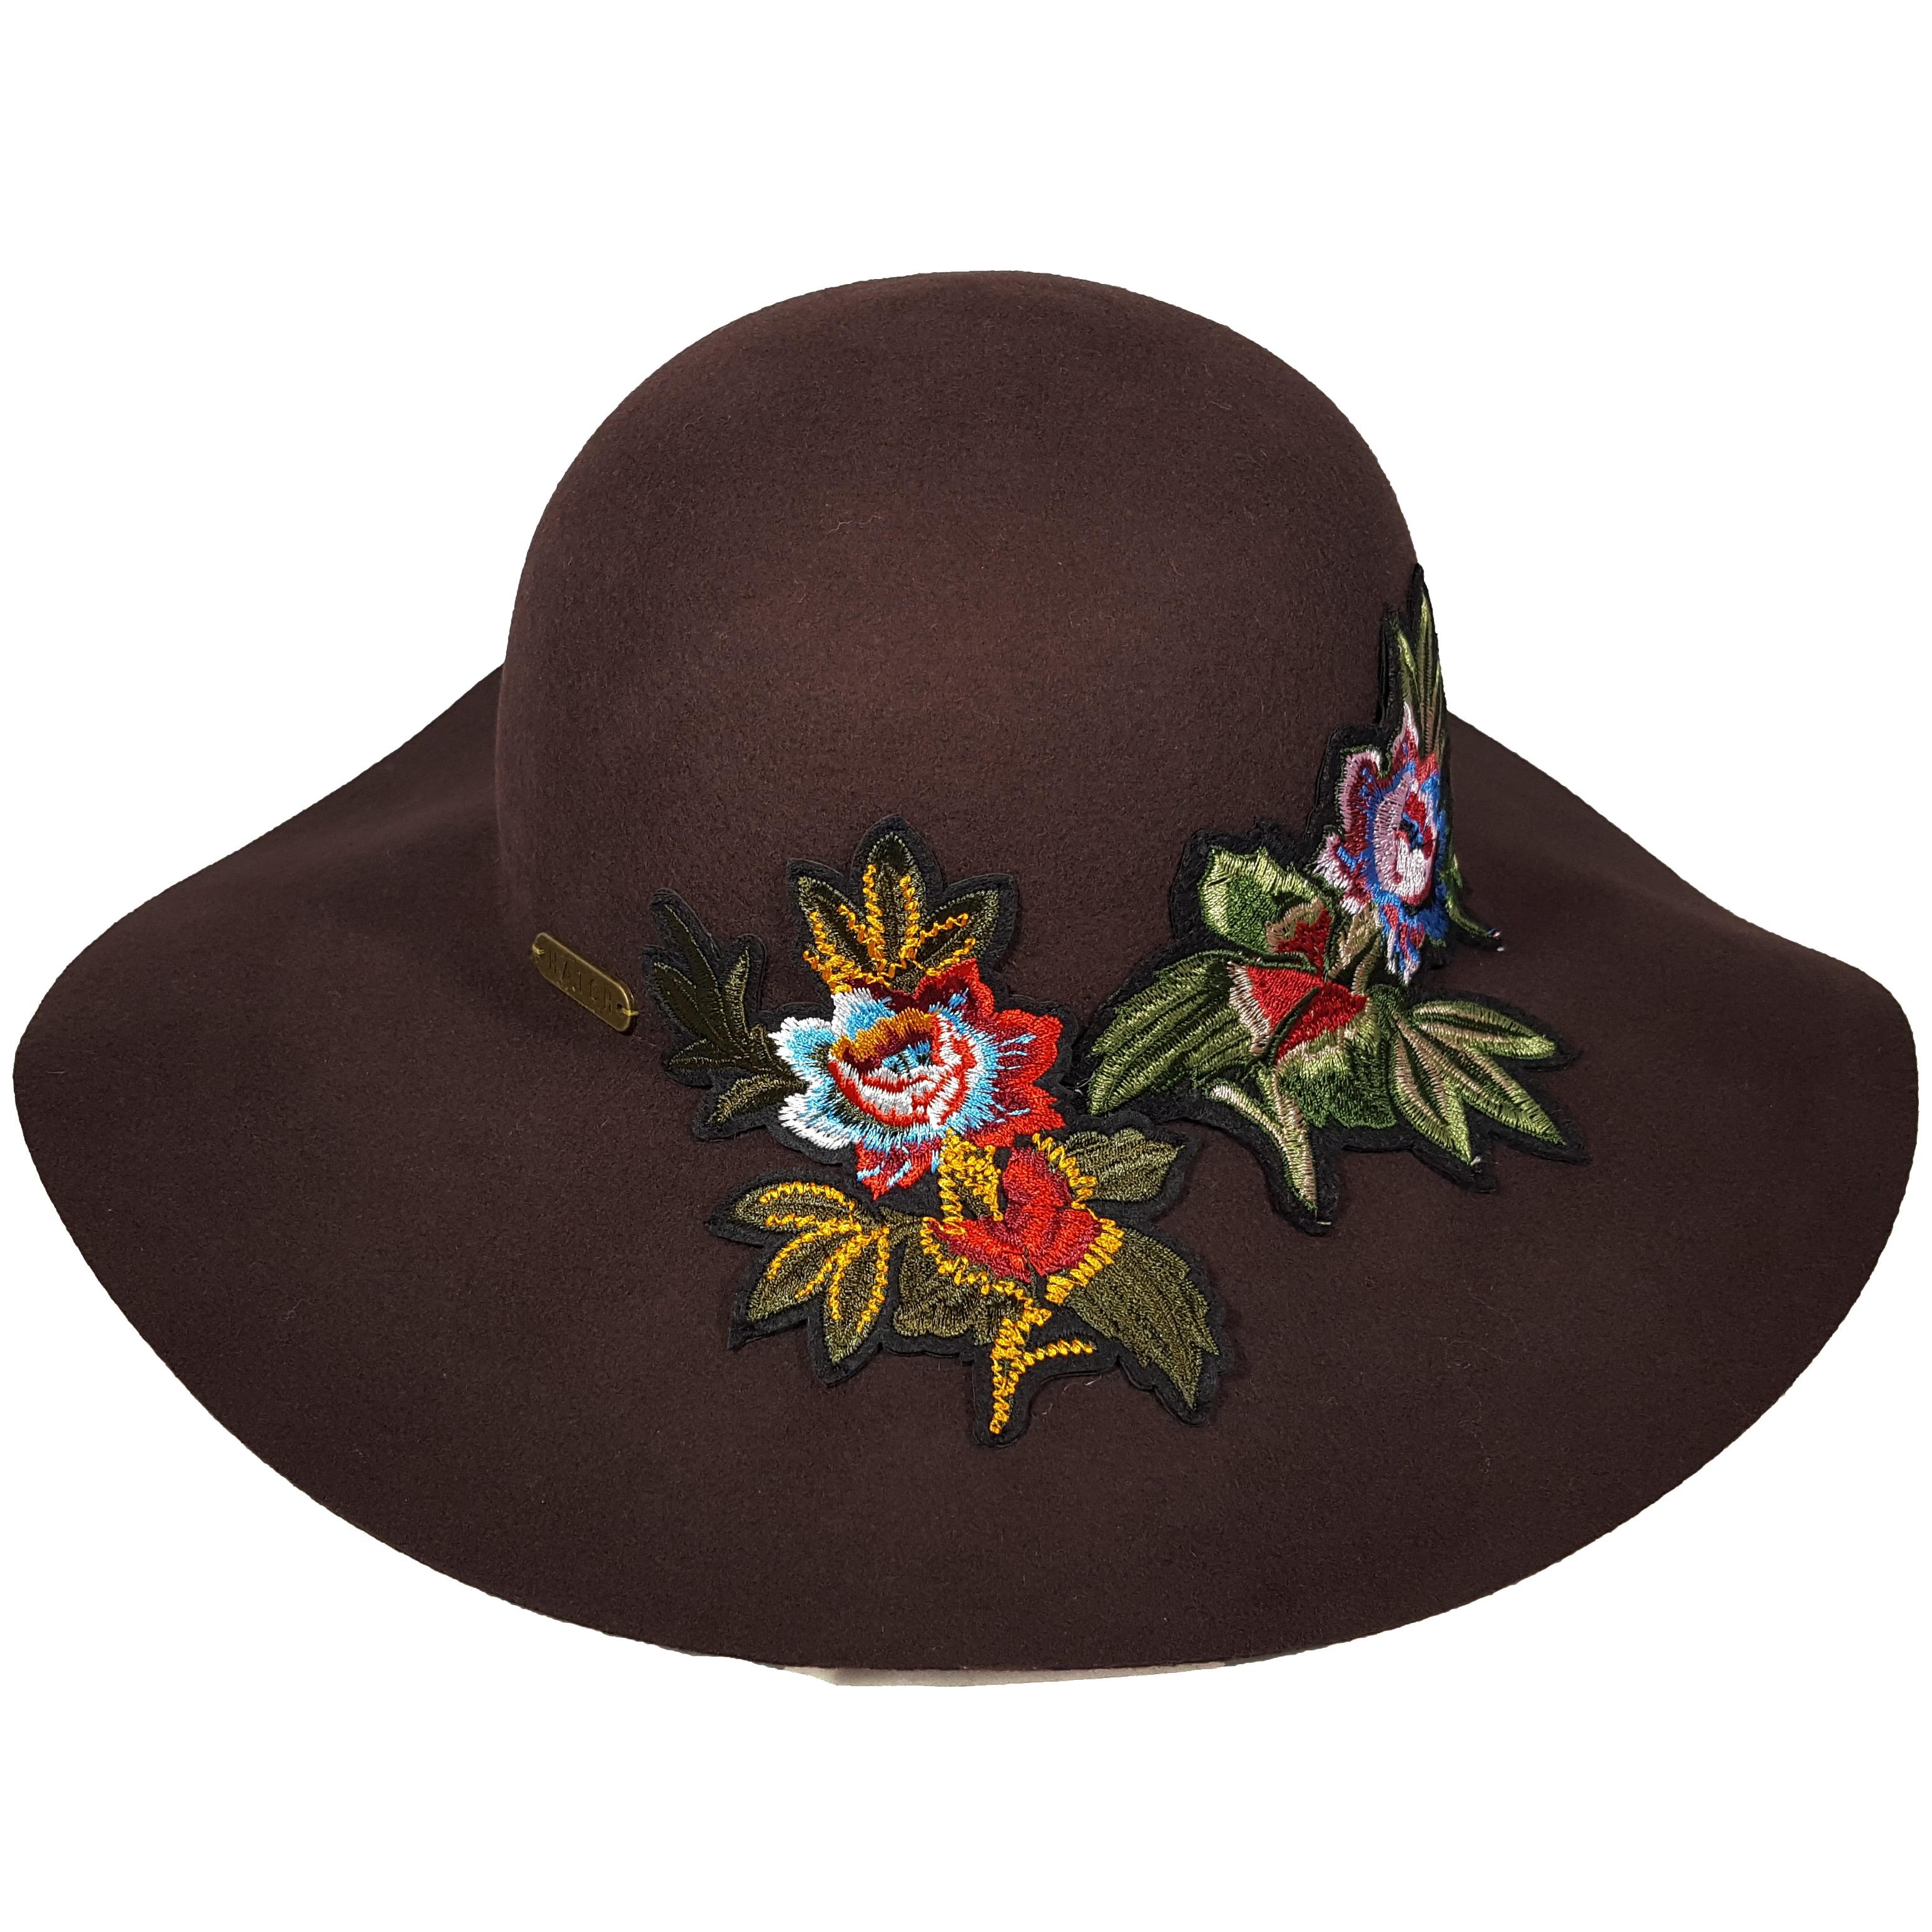 ec023495b4c Shop Hatch Floral Applique Wool Felt Floppy Wide Brim Women s Hat - Free  Shipping Today - Overstock - 19433908